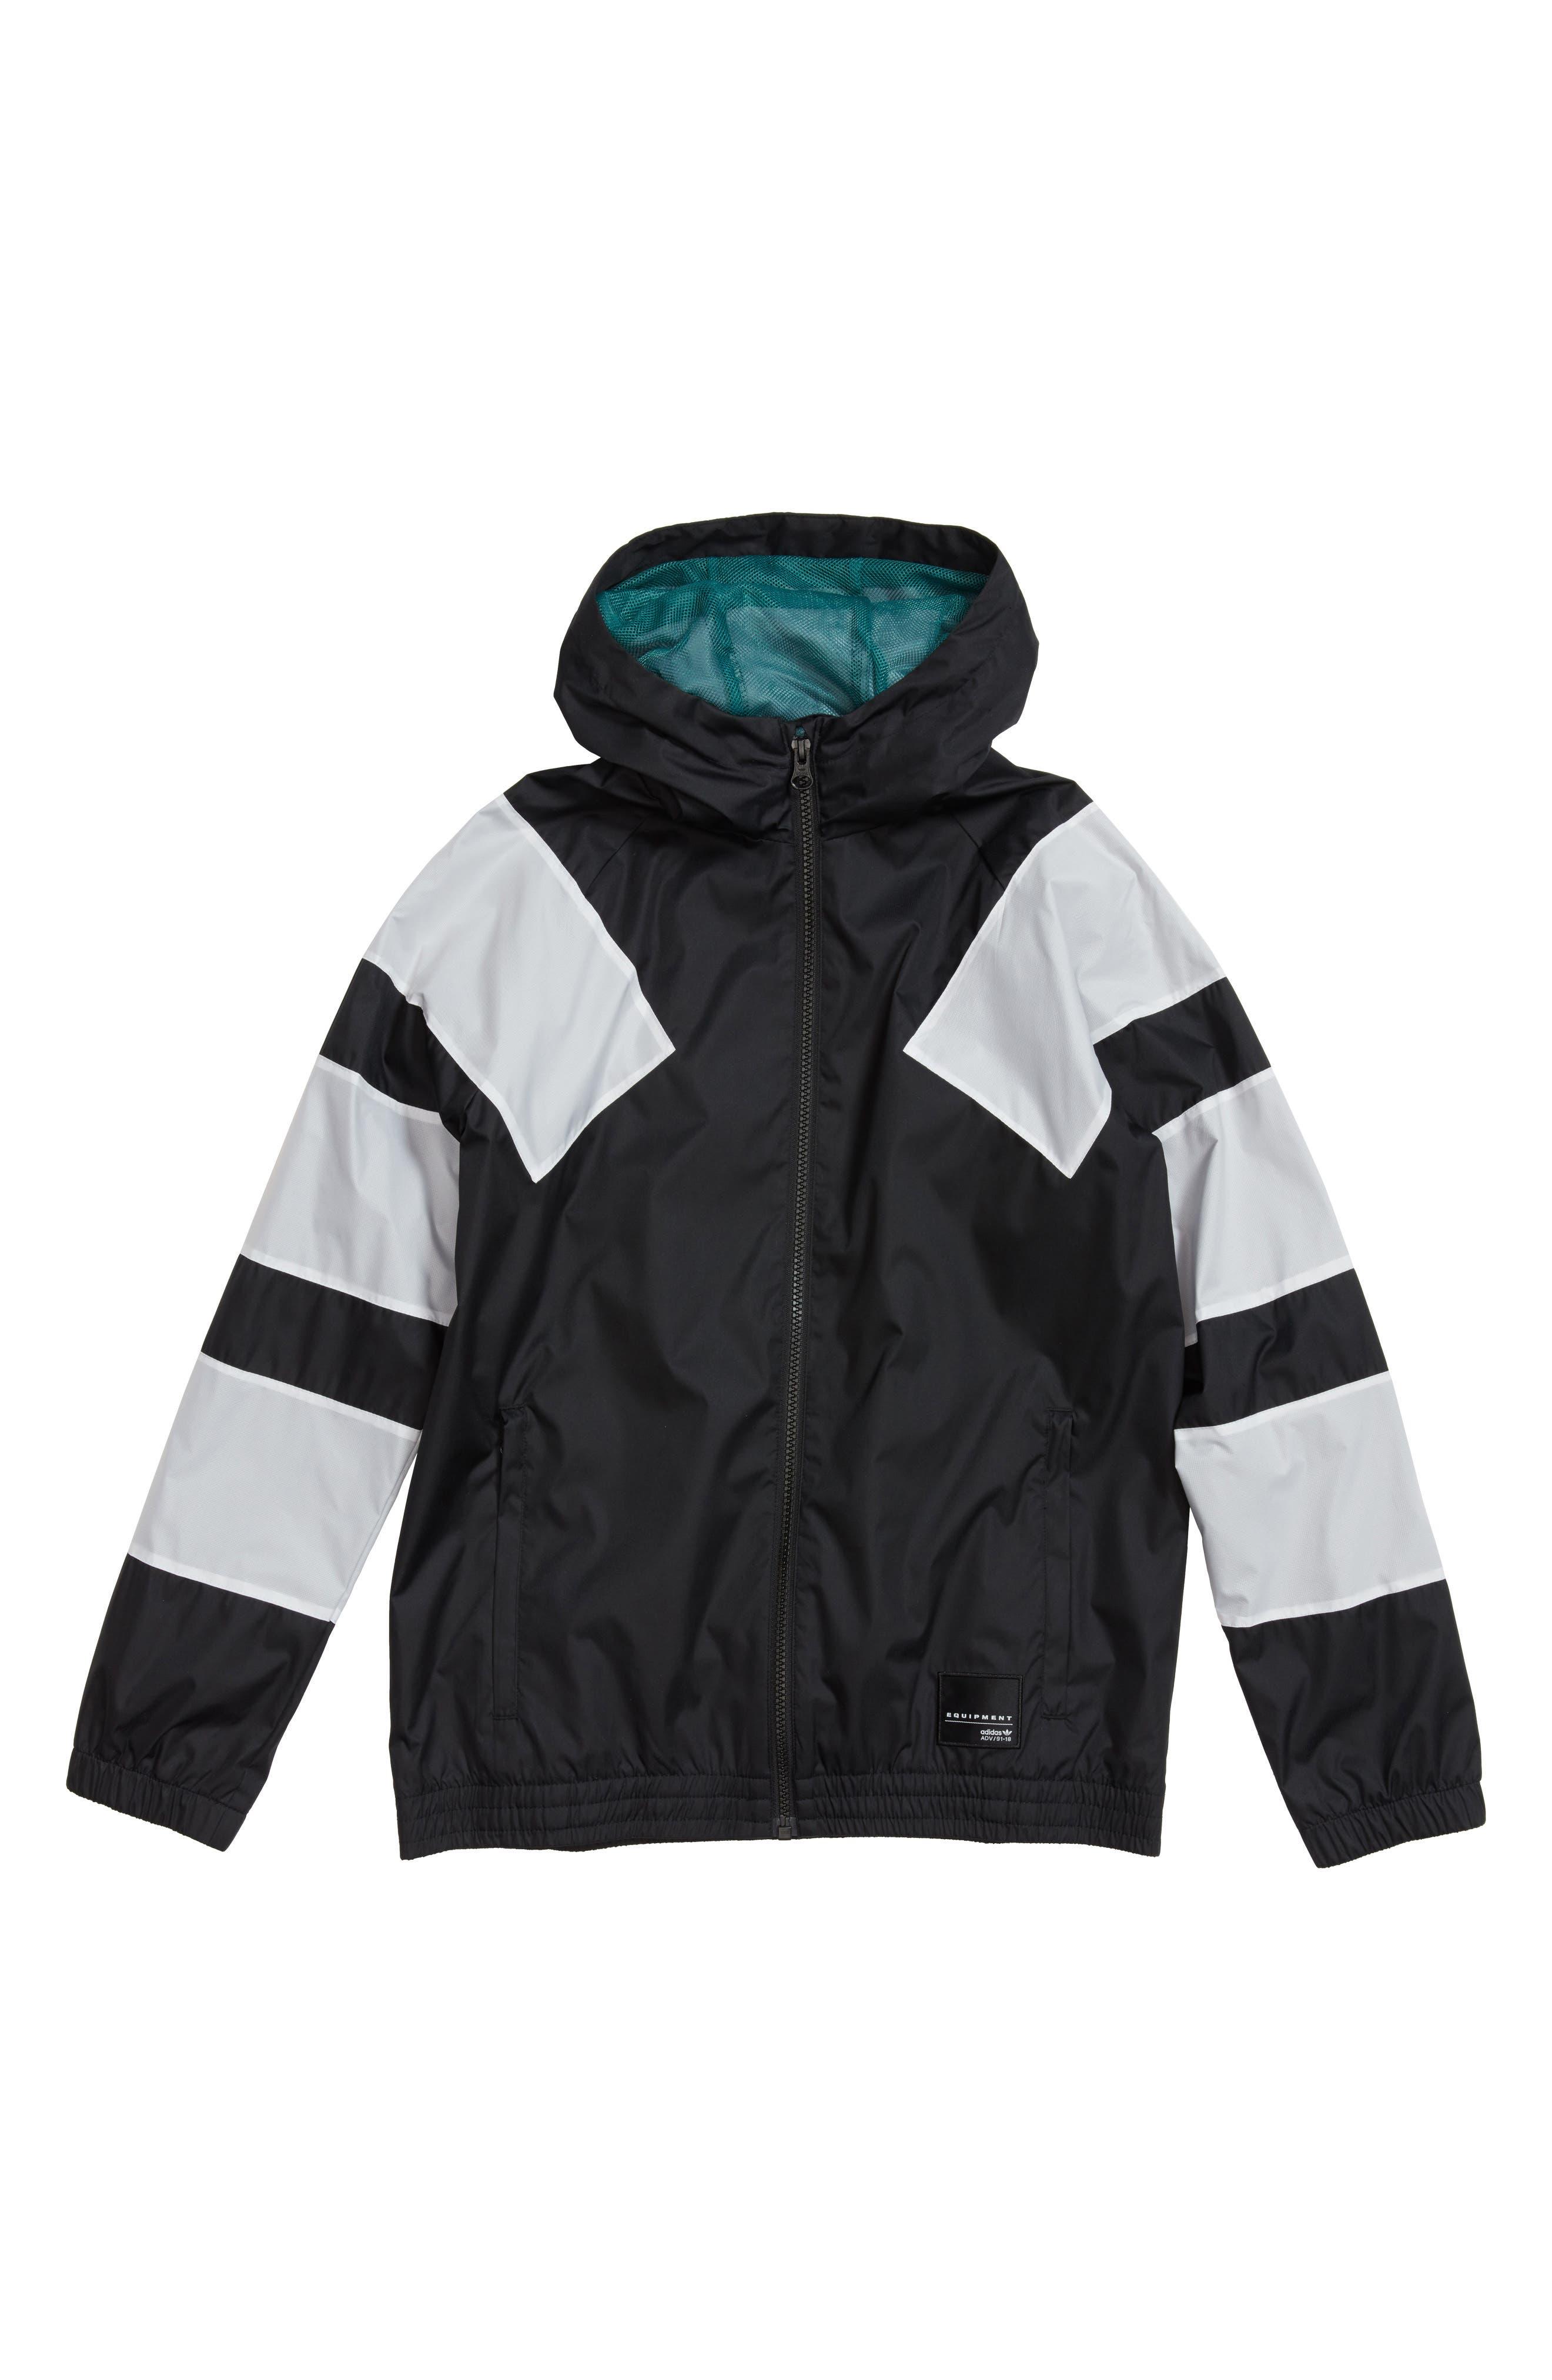 adidas Originals EQT Hooded Windbreaker Jacket (Little Boys & Big Boys)